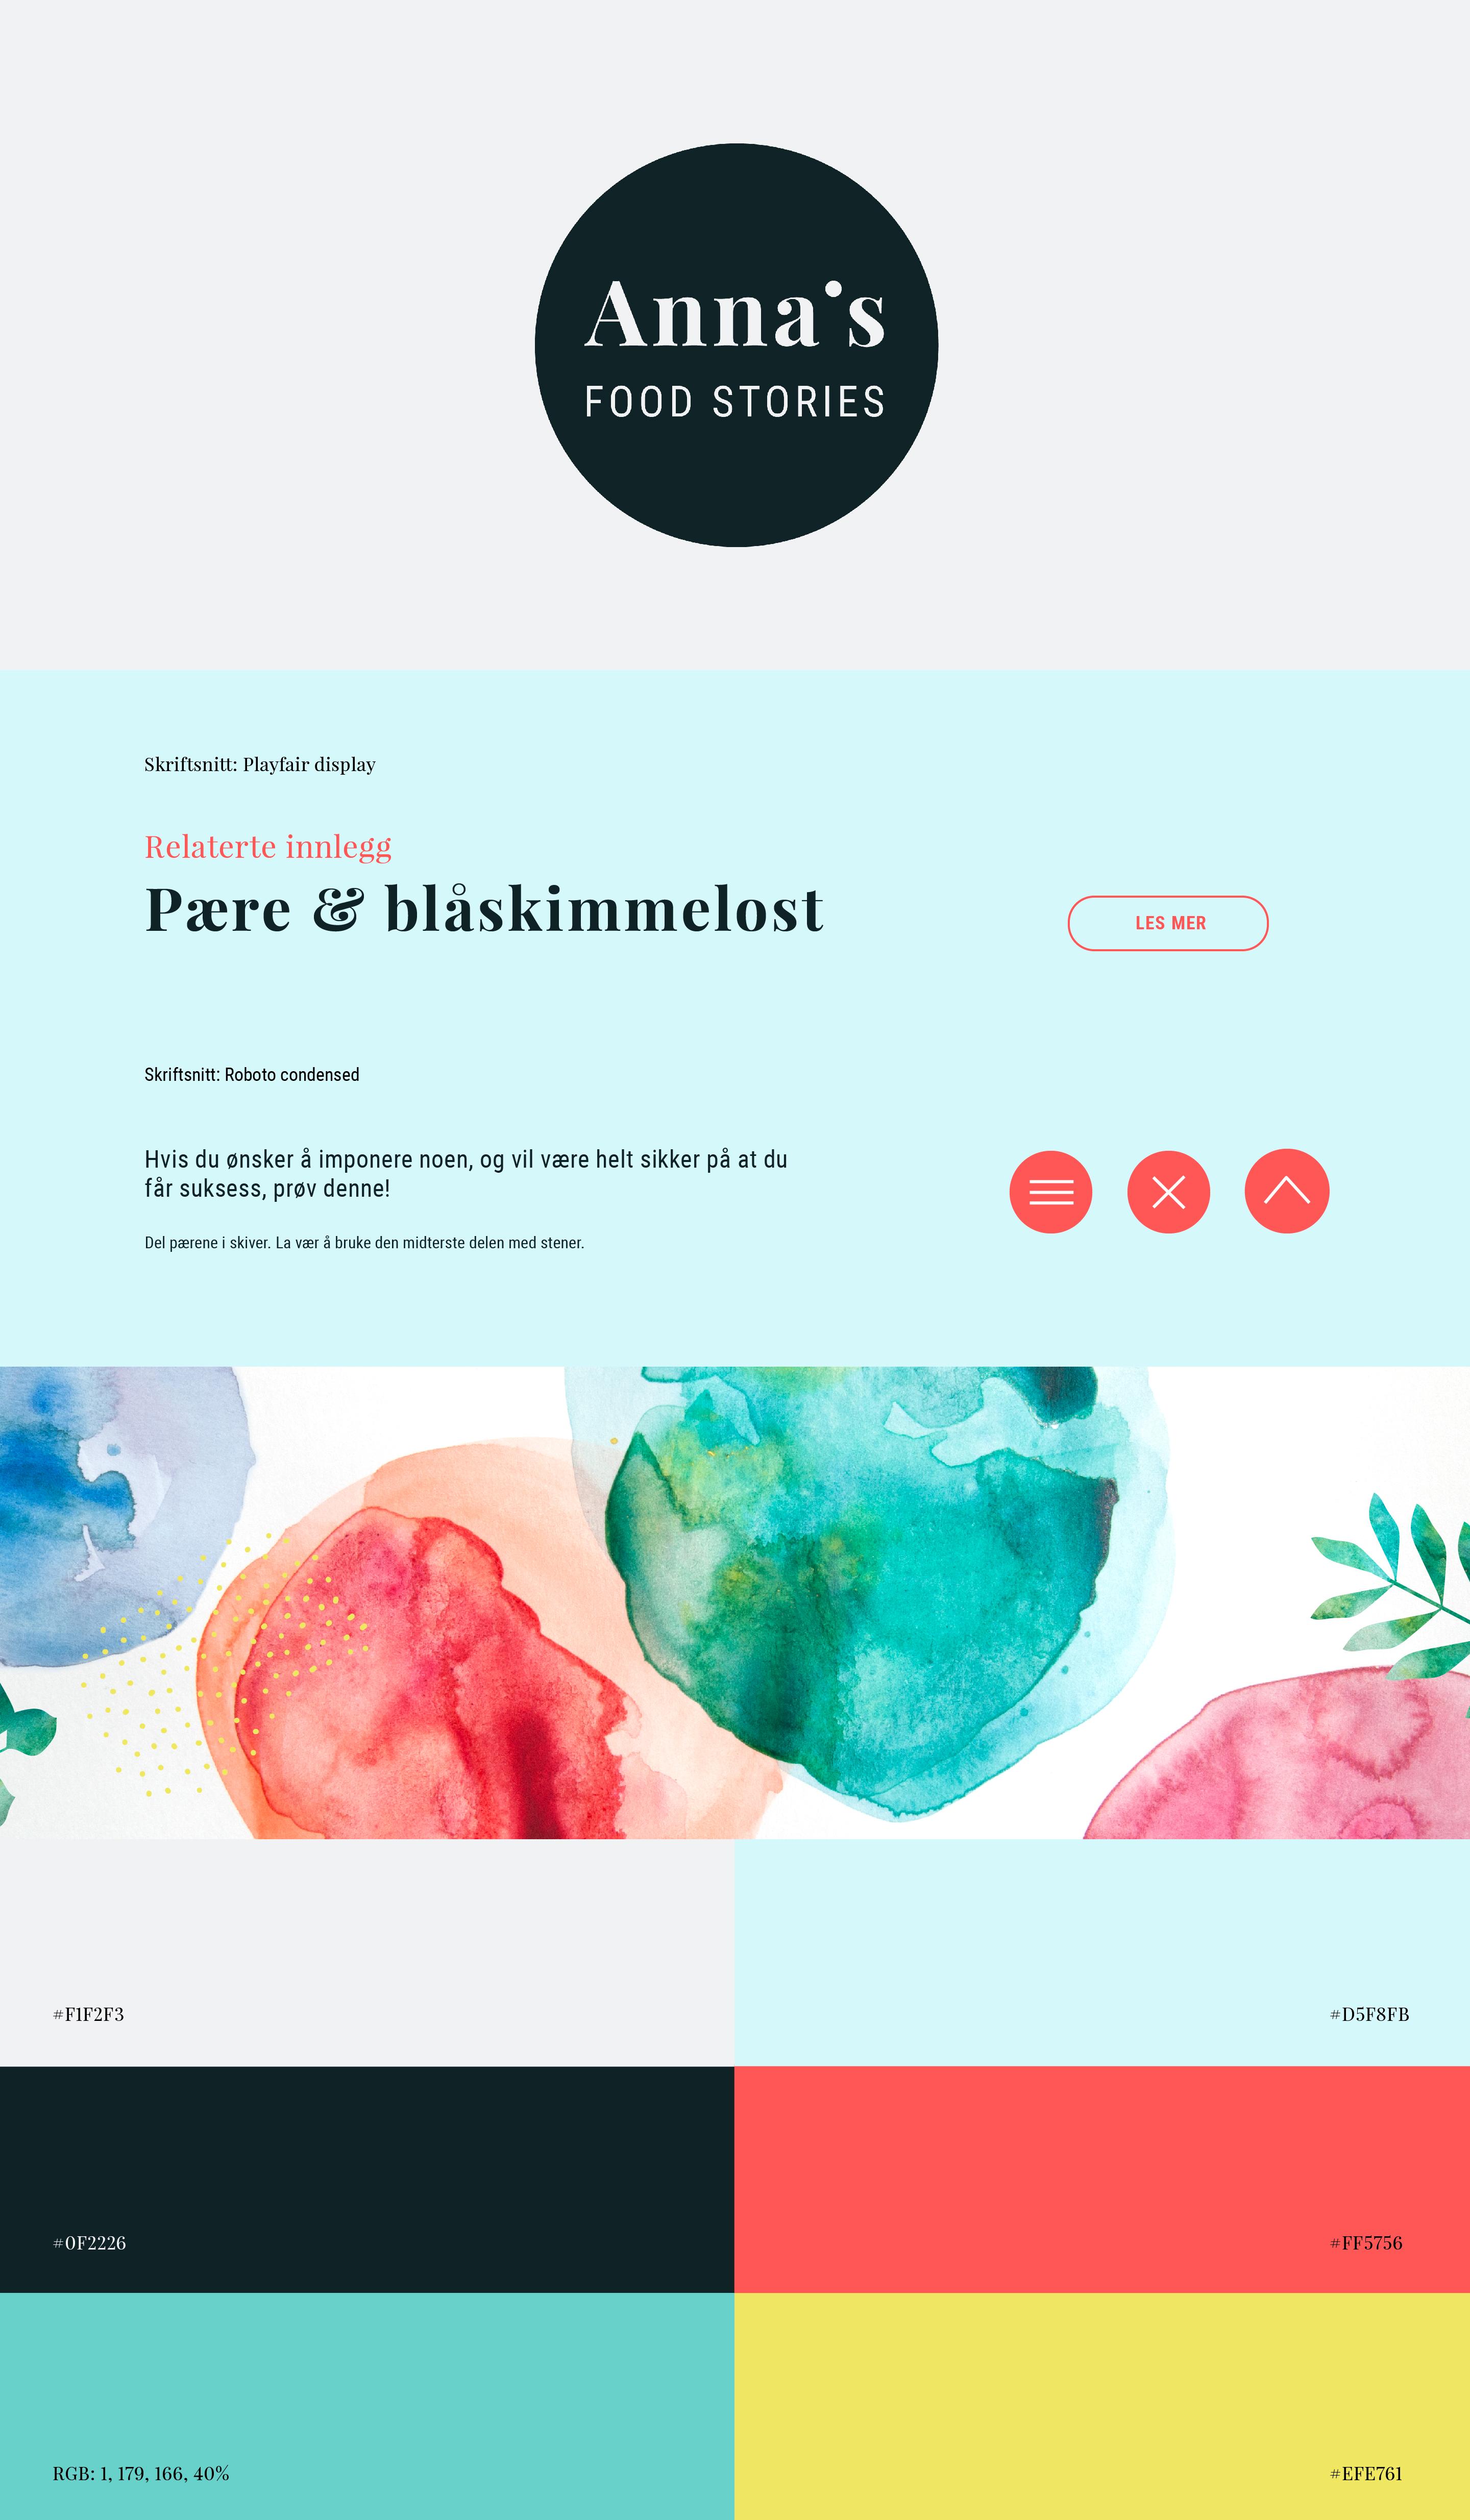 Annas food stories - blogg design - logo - identitet - mat